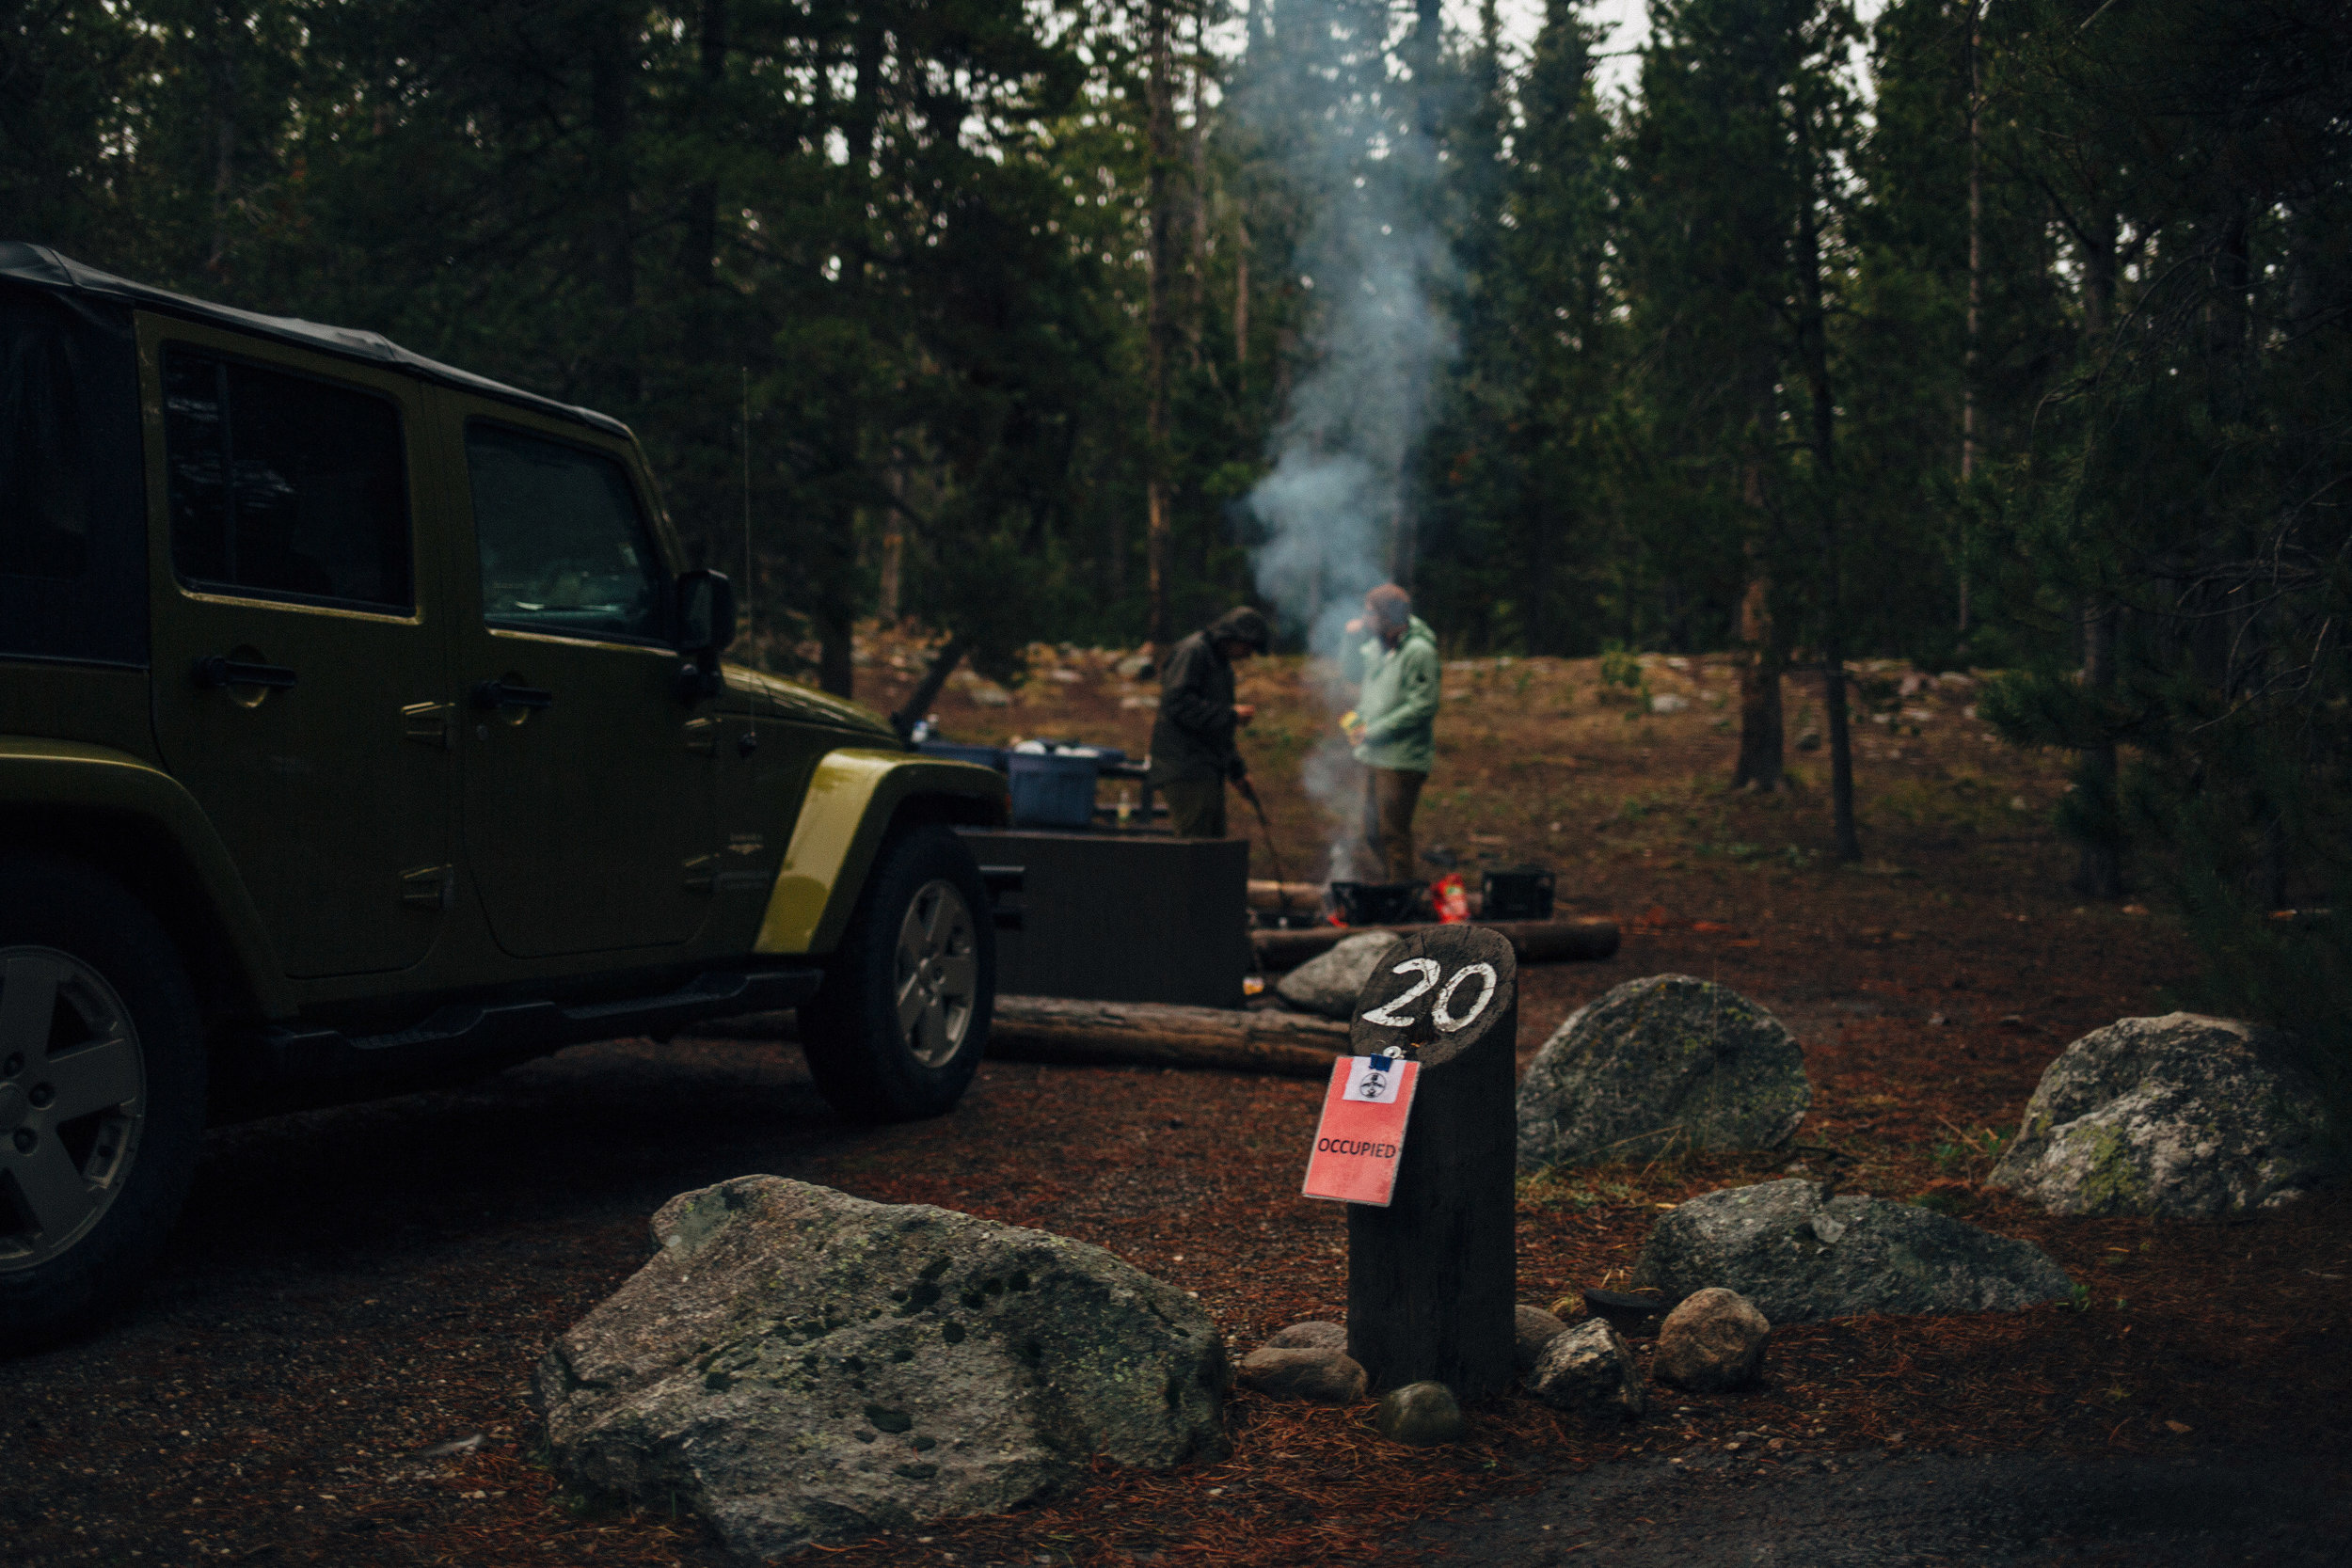 NSR_HappyScamper_RoadTrip_lowres-NSR_2147.jpg